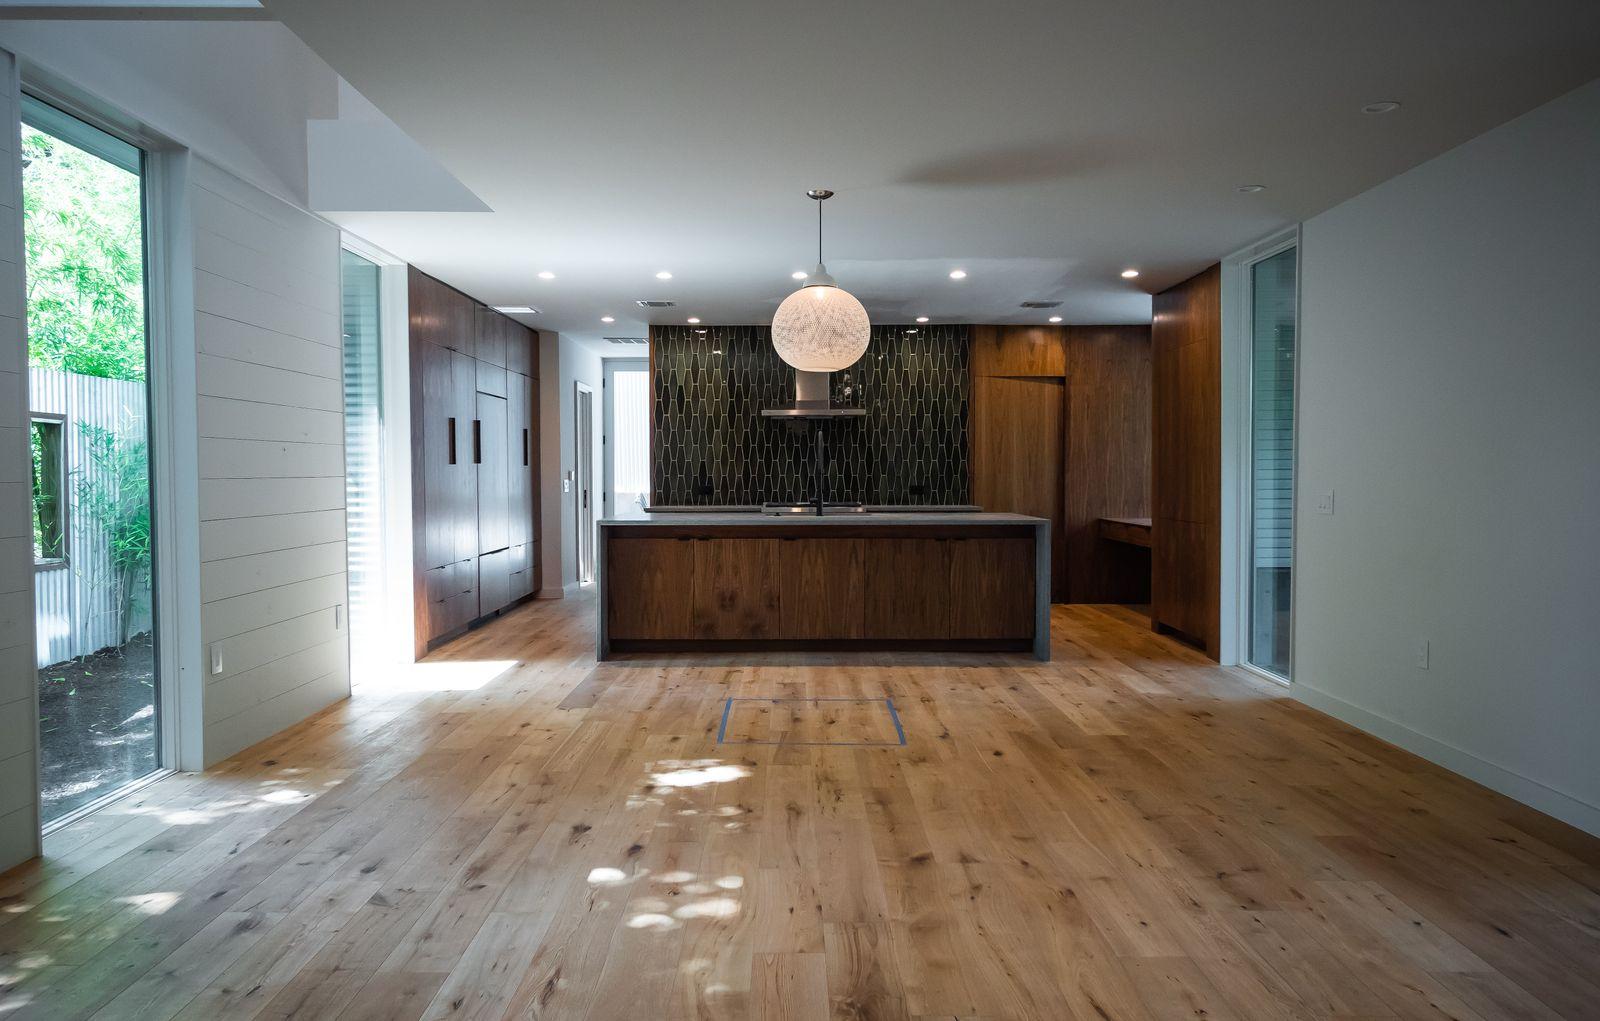 kitchen fullframe.jpg